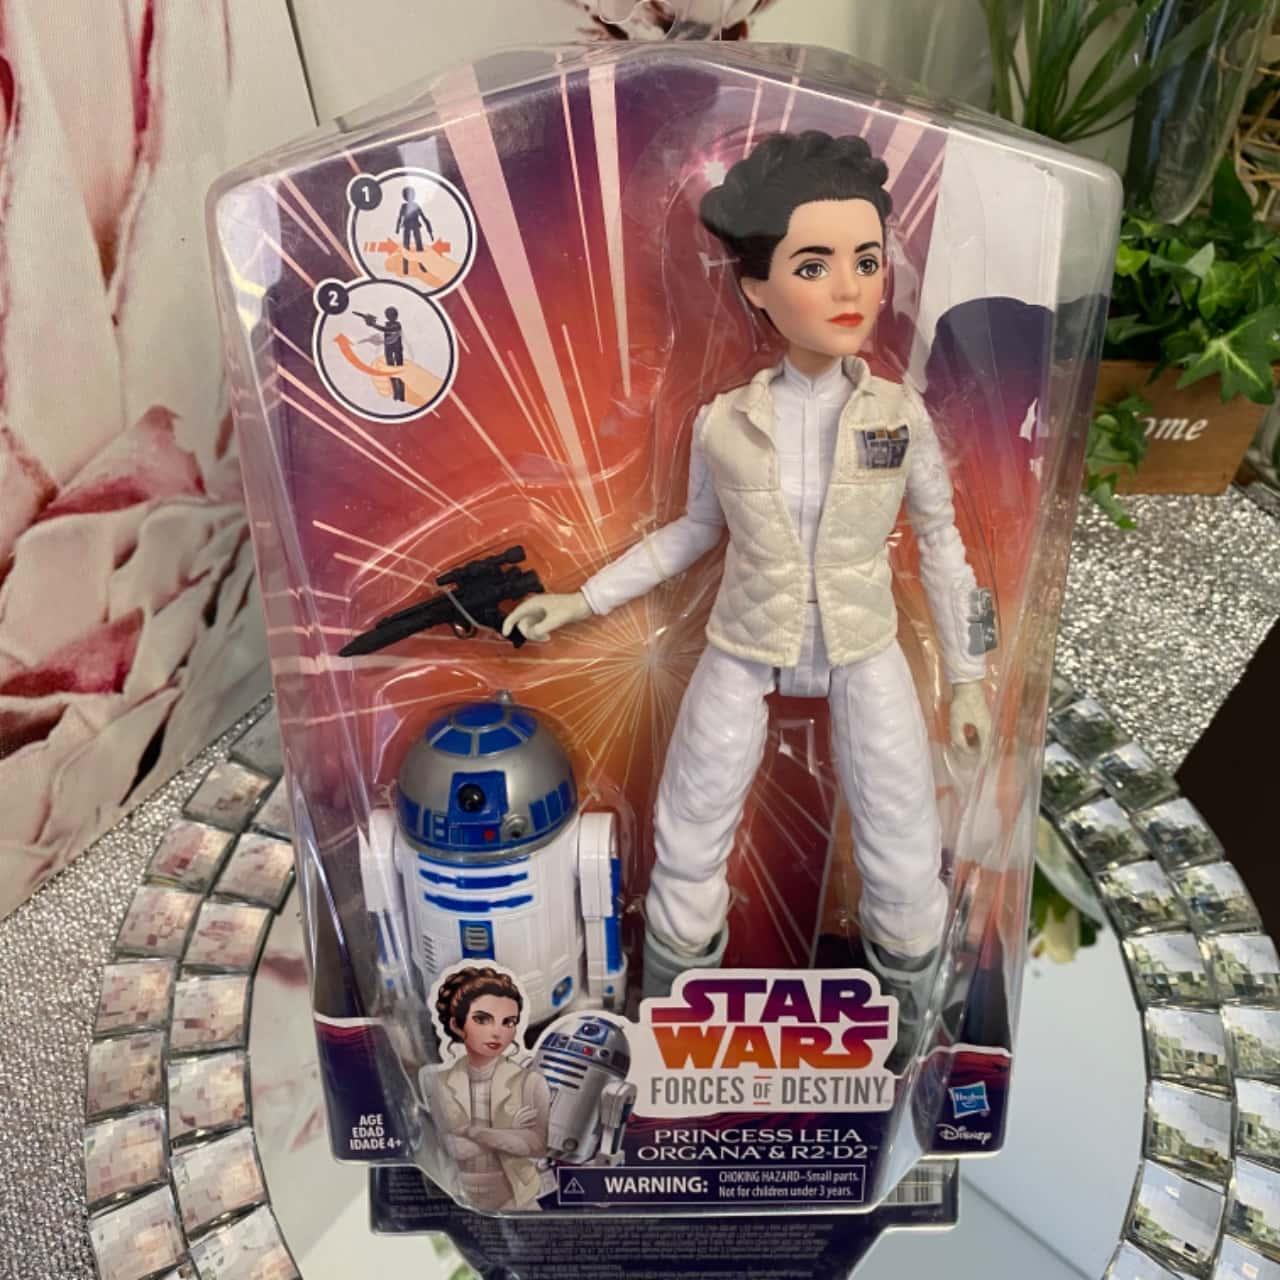 "STAR WARS FORCES OF DESTINY PRINCESS LEIA ORGANA & R2-D2 12"" ACTION FIGURE"